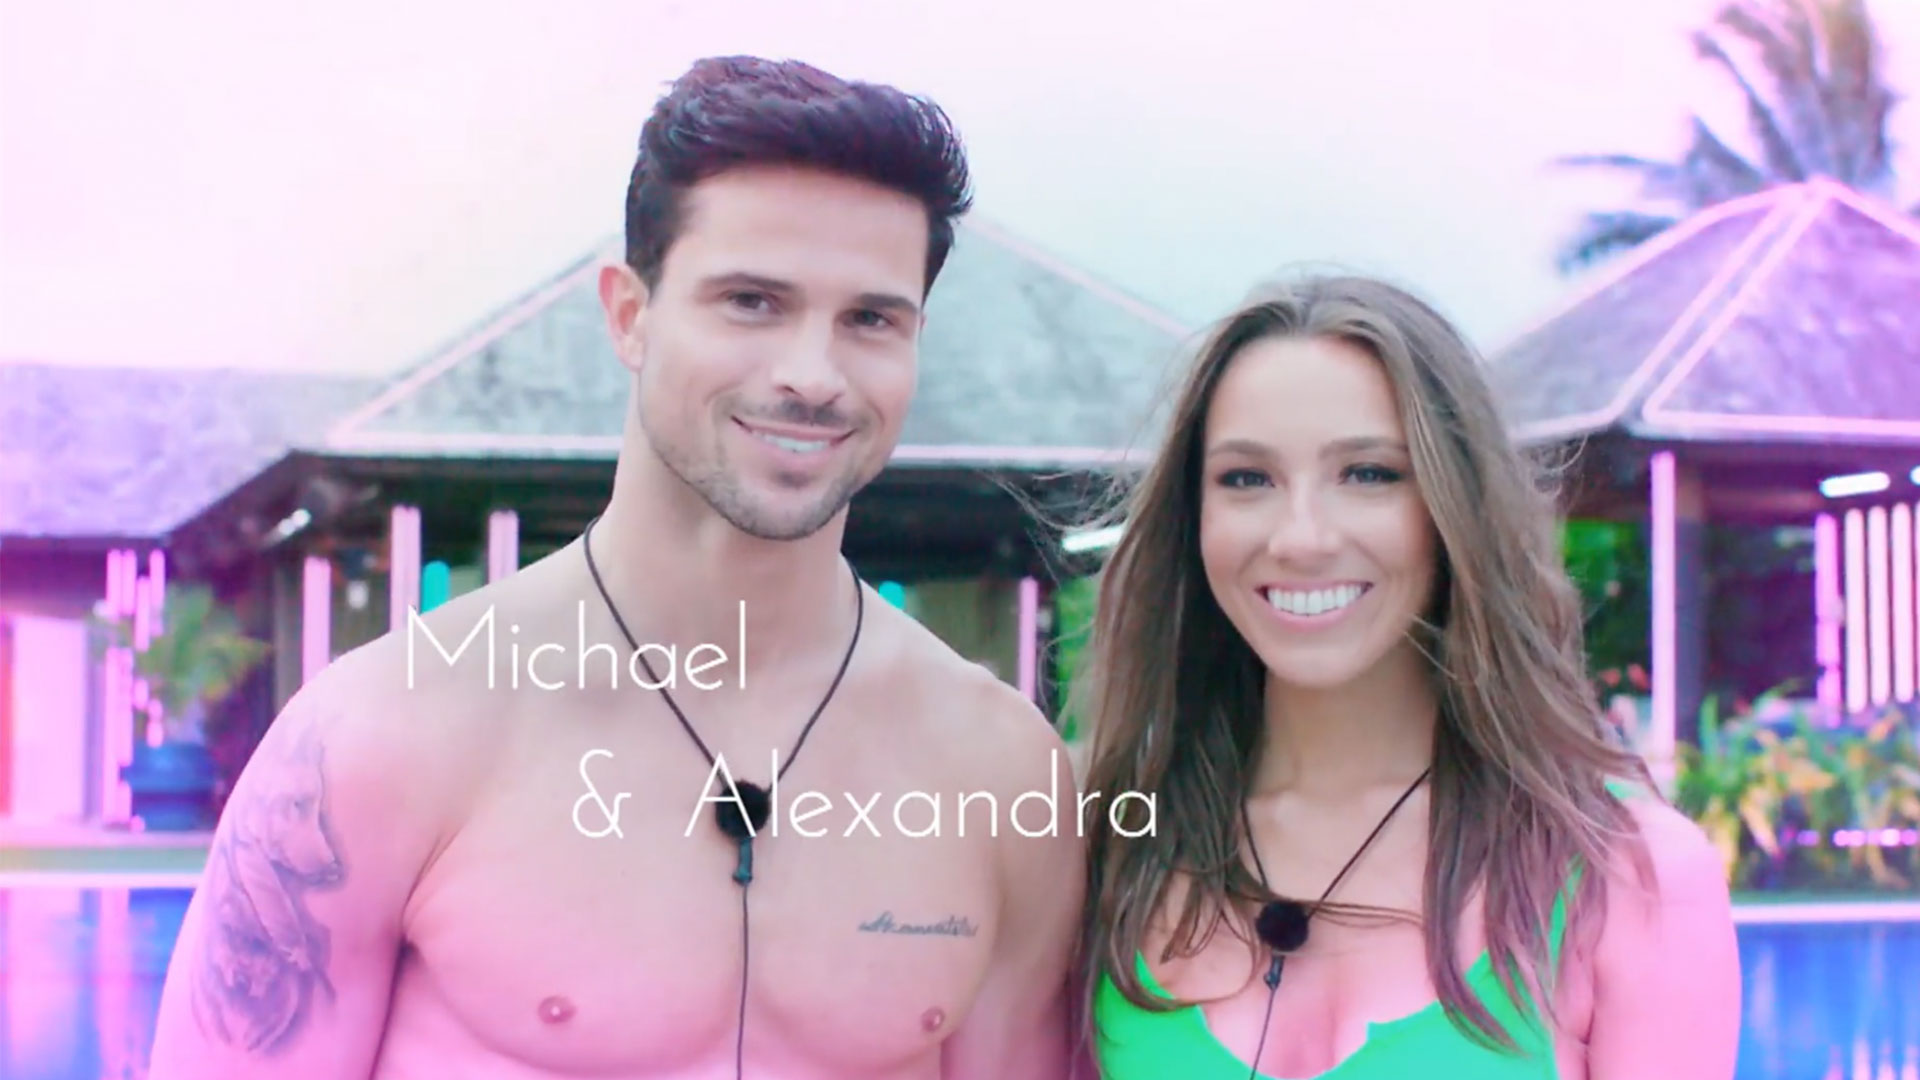 Michael and Alexandra